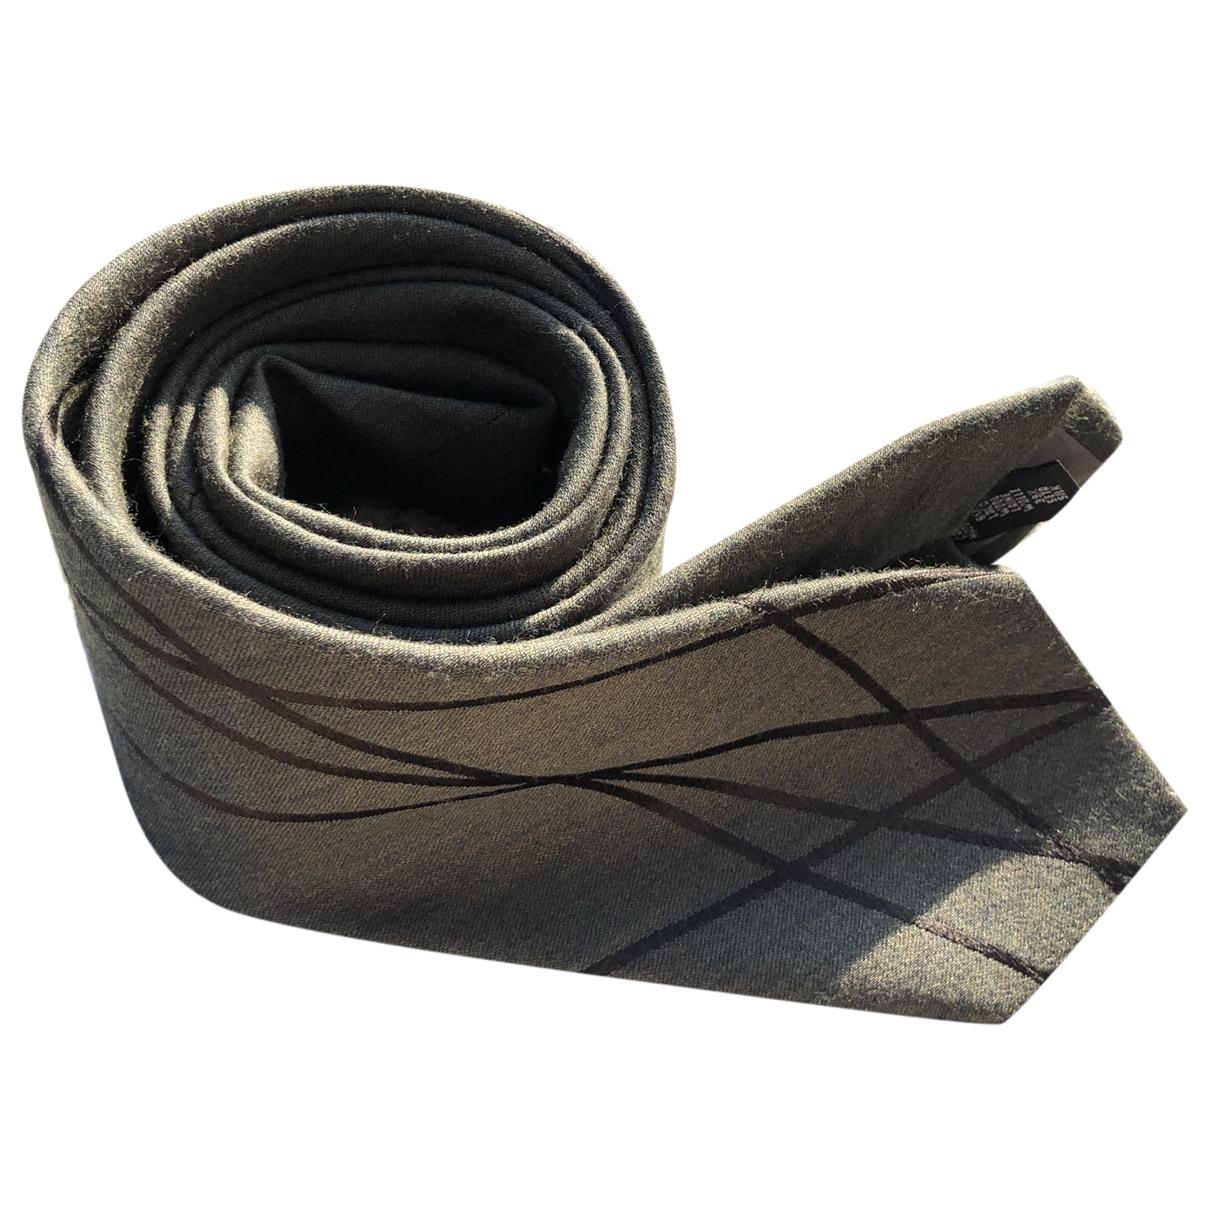 Emporio Armani \N Krawatten in  Khaki Wolle